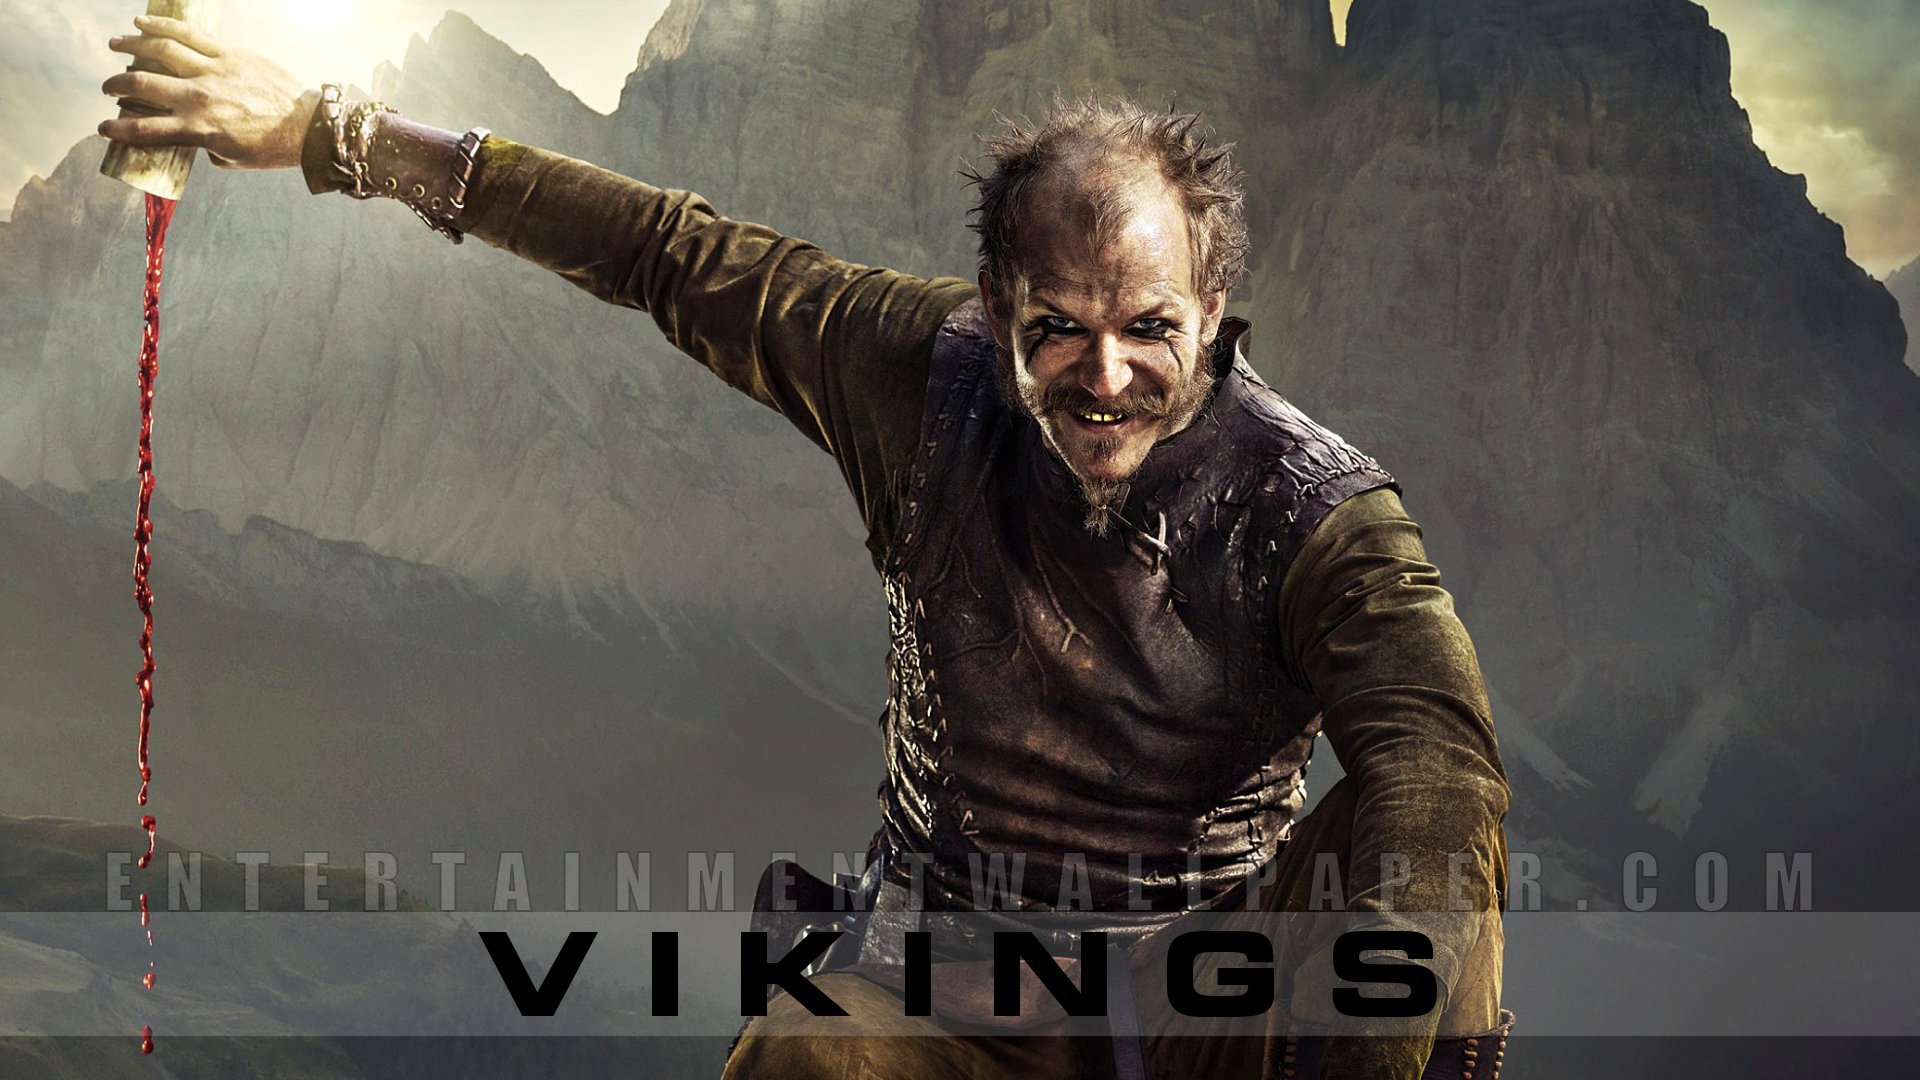 Si eres fan de vikingos algun wallpaper te llevas hd   Taringa 1920x1080